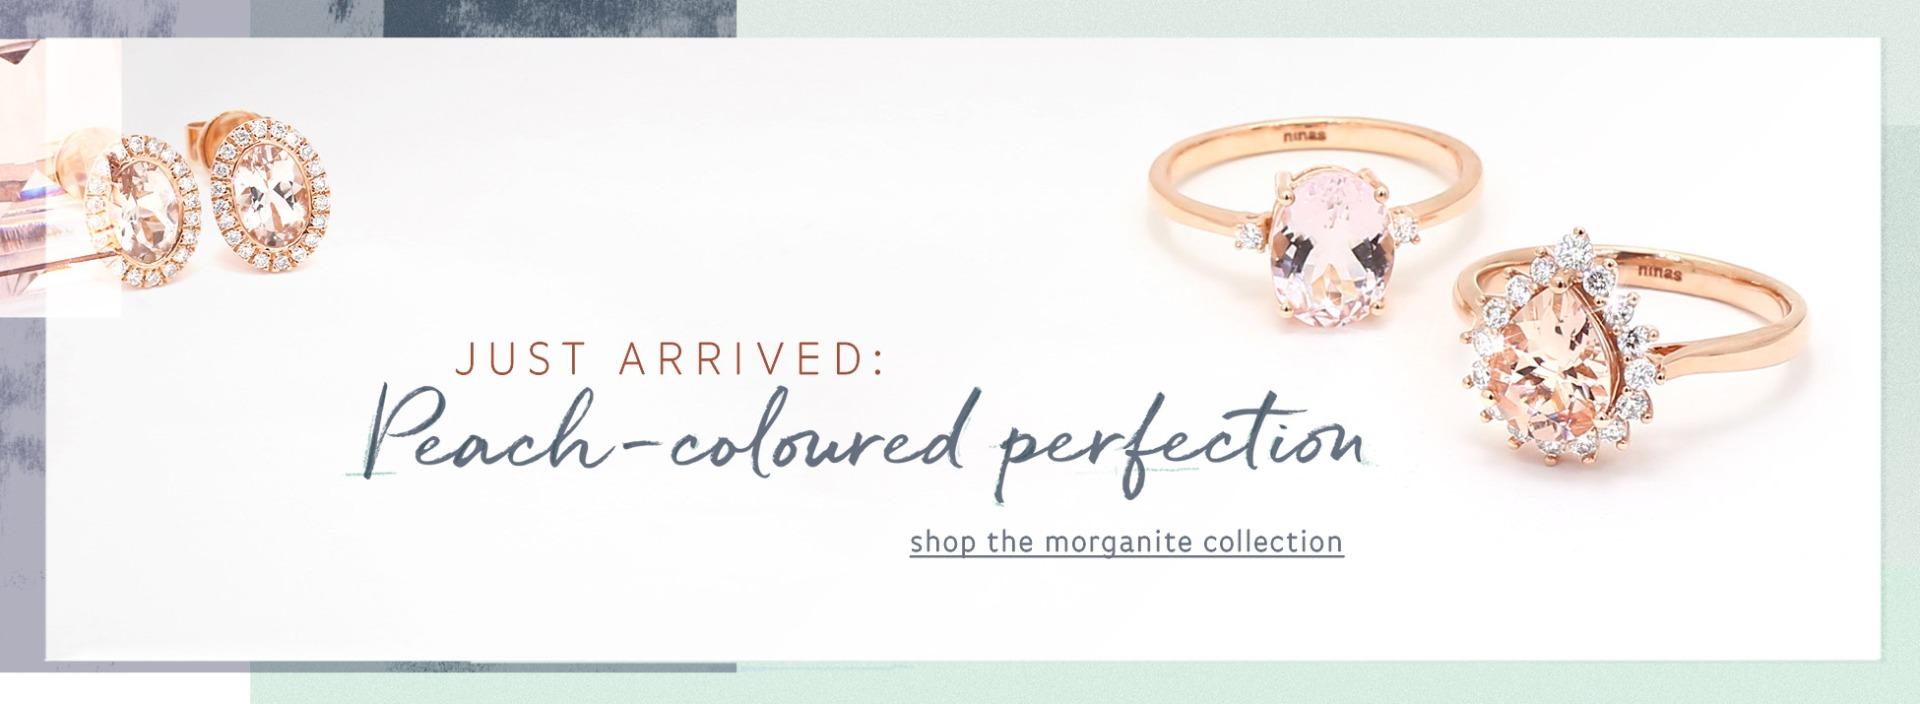 Morganite Jewellery - Peach coloured perfection